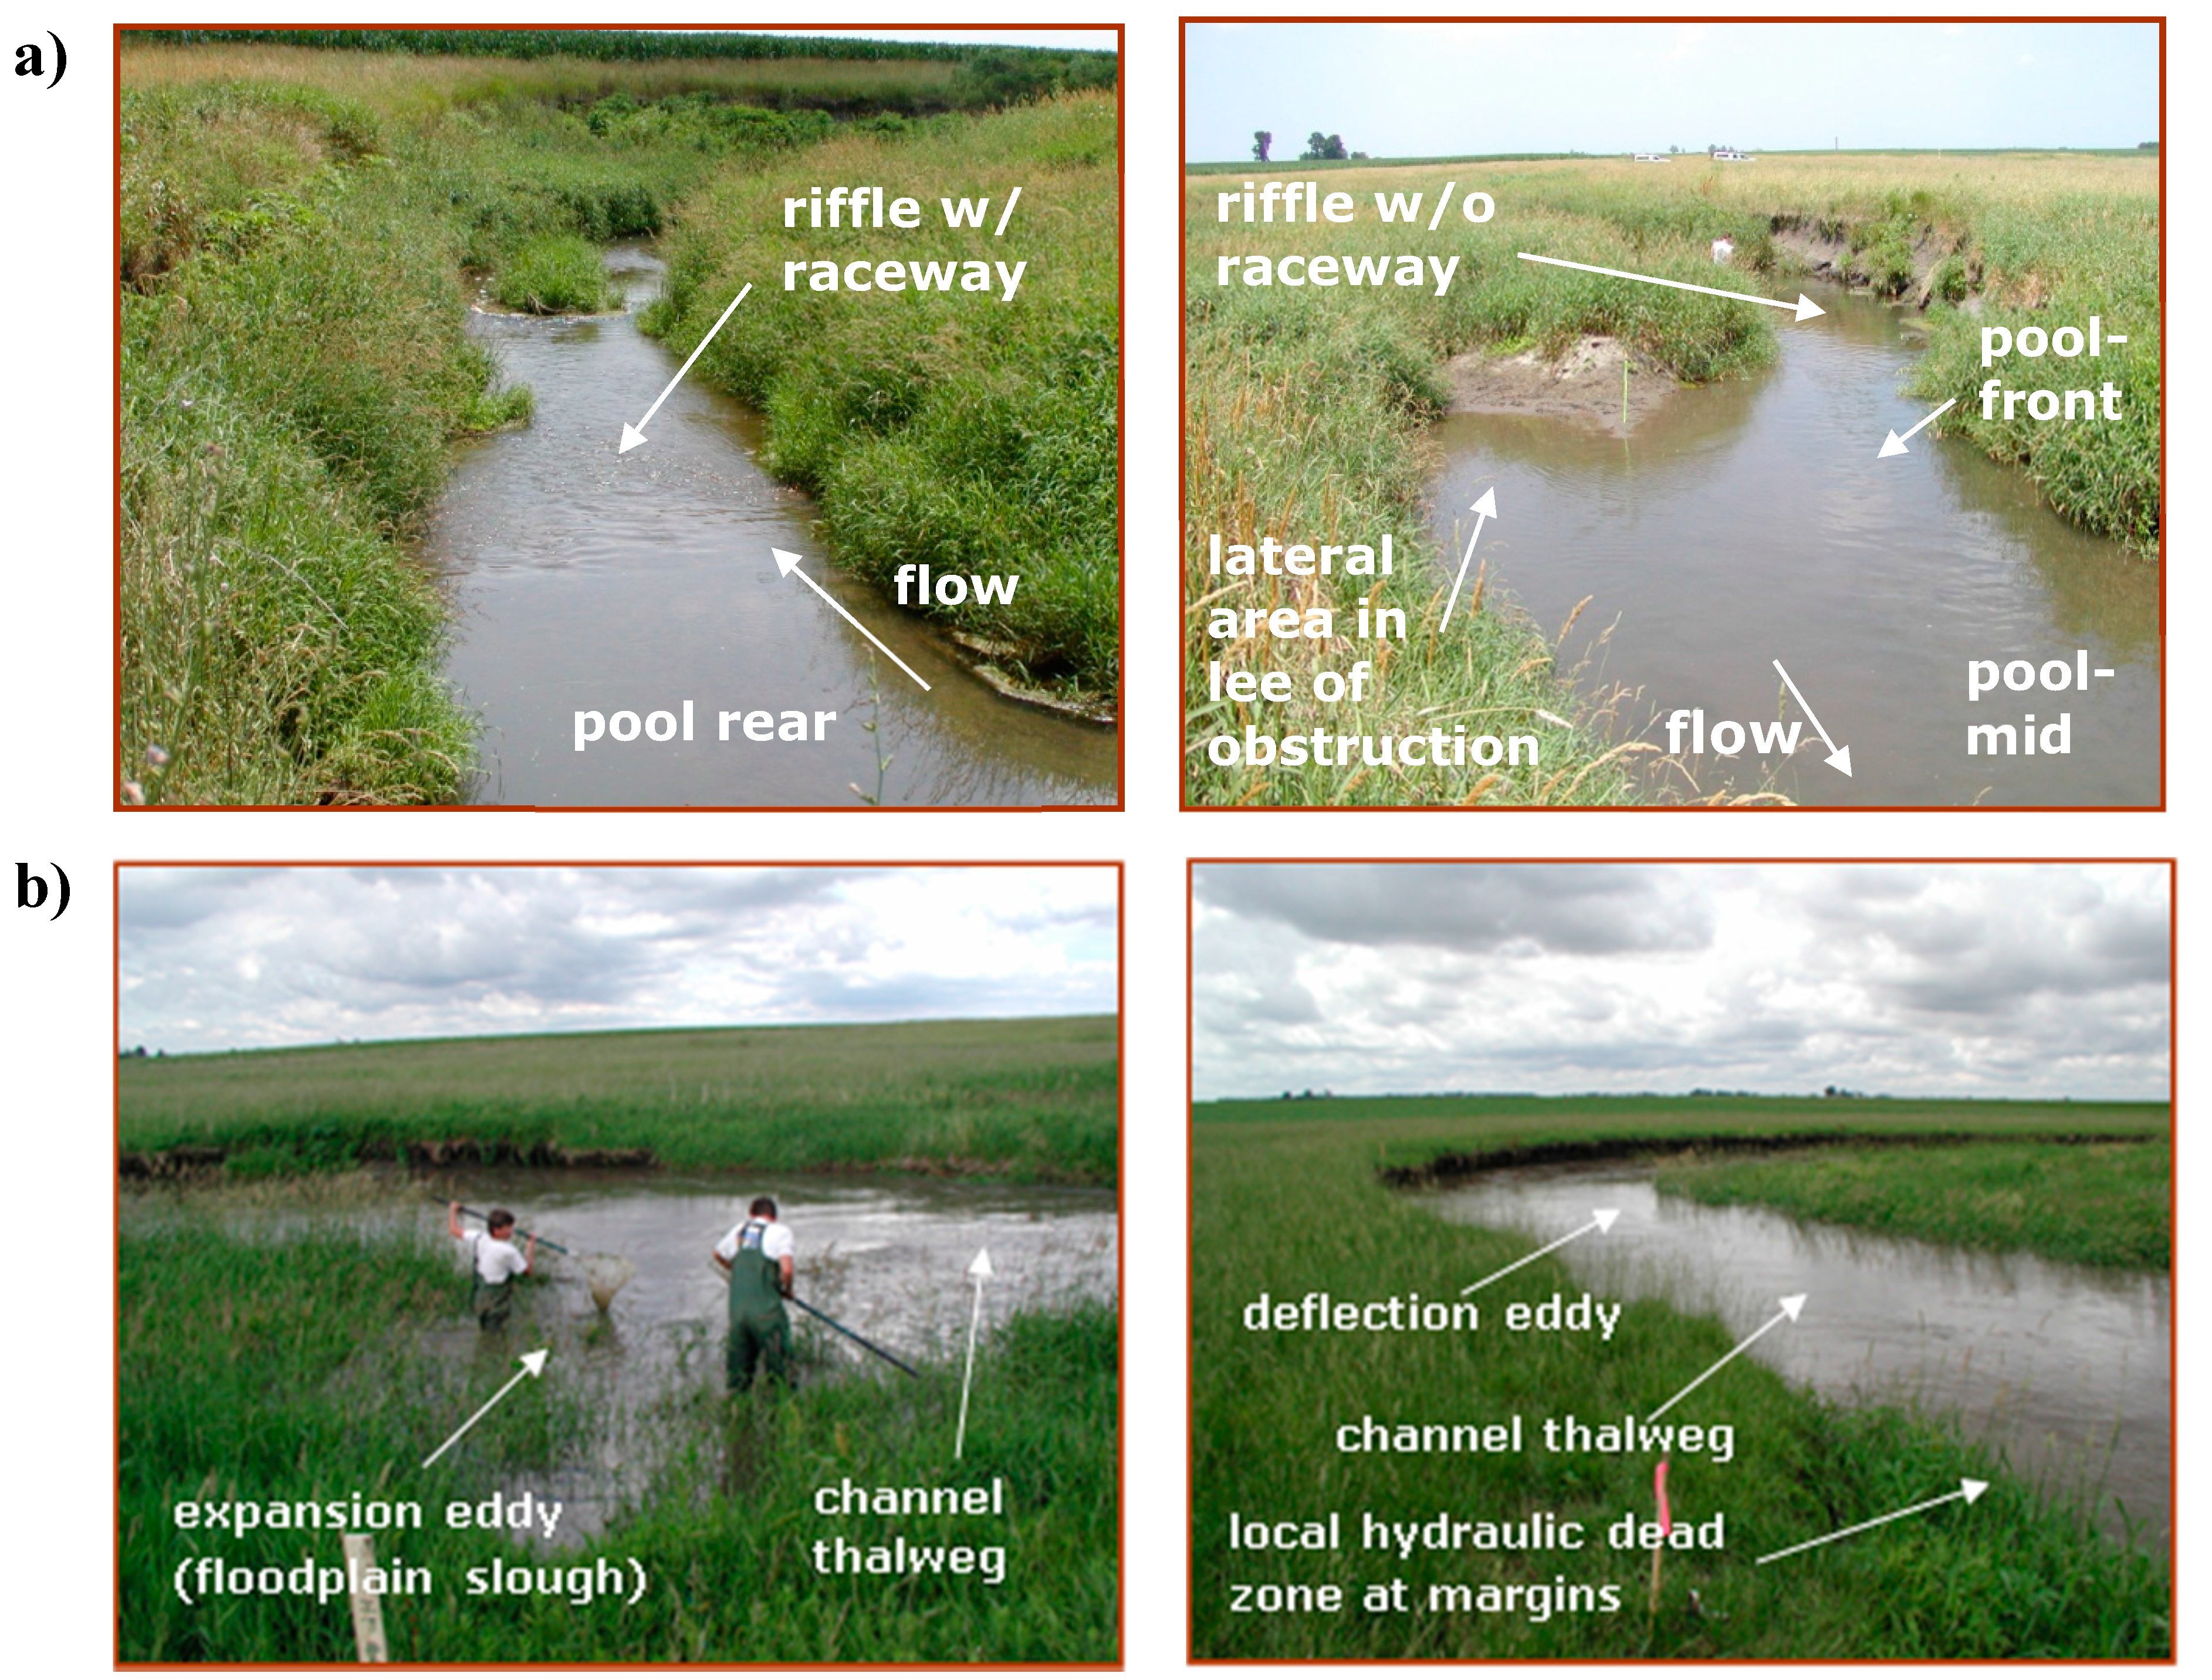 a review of stream restoration choice image